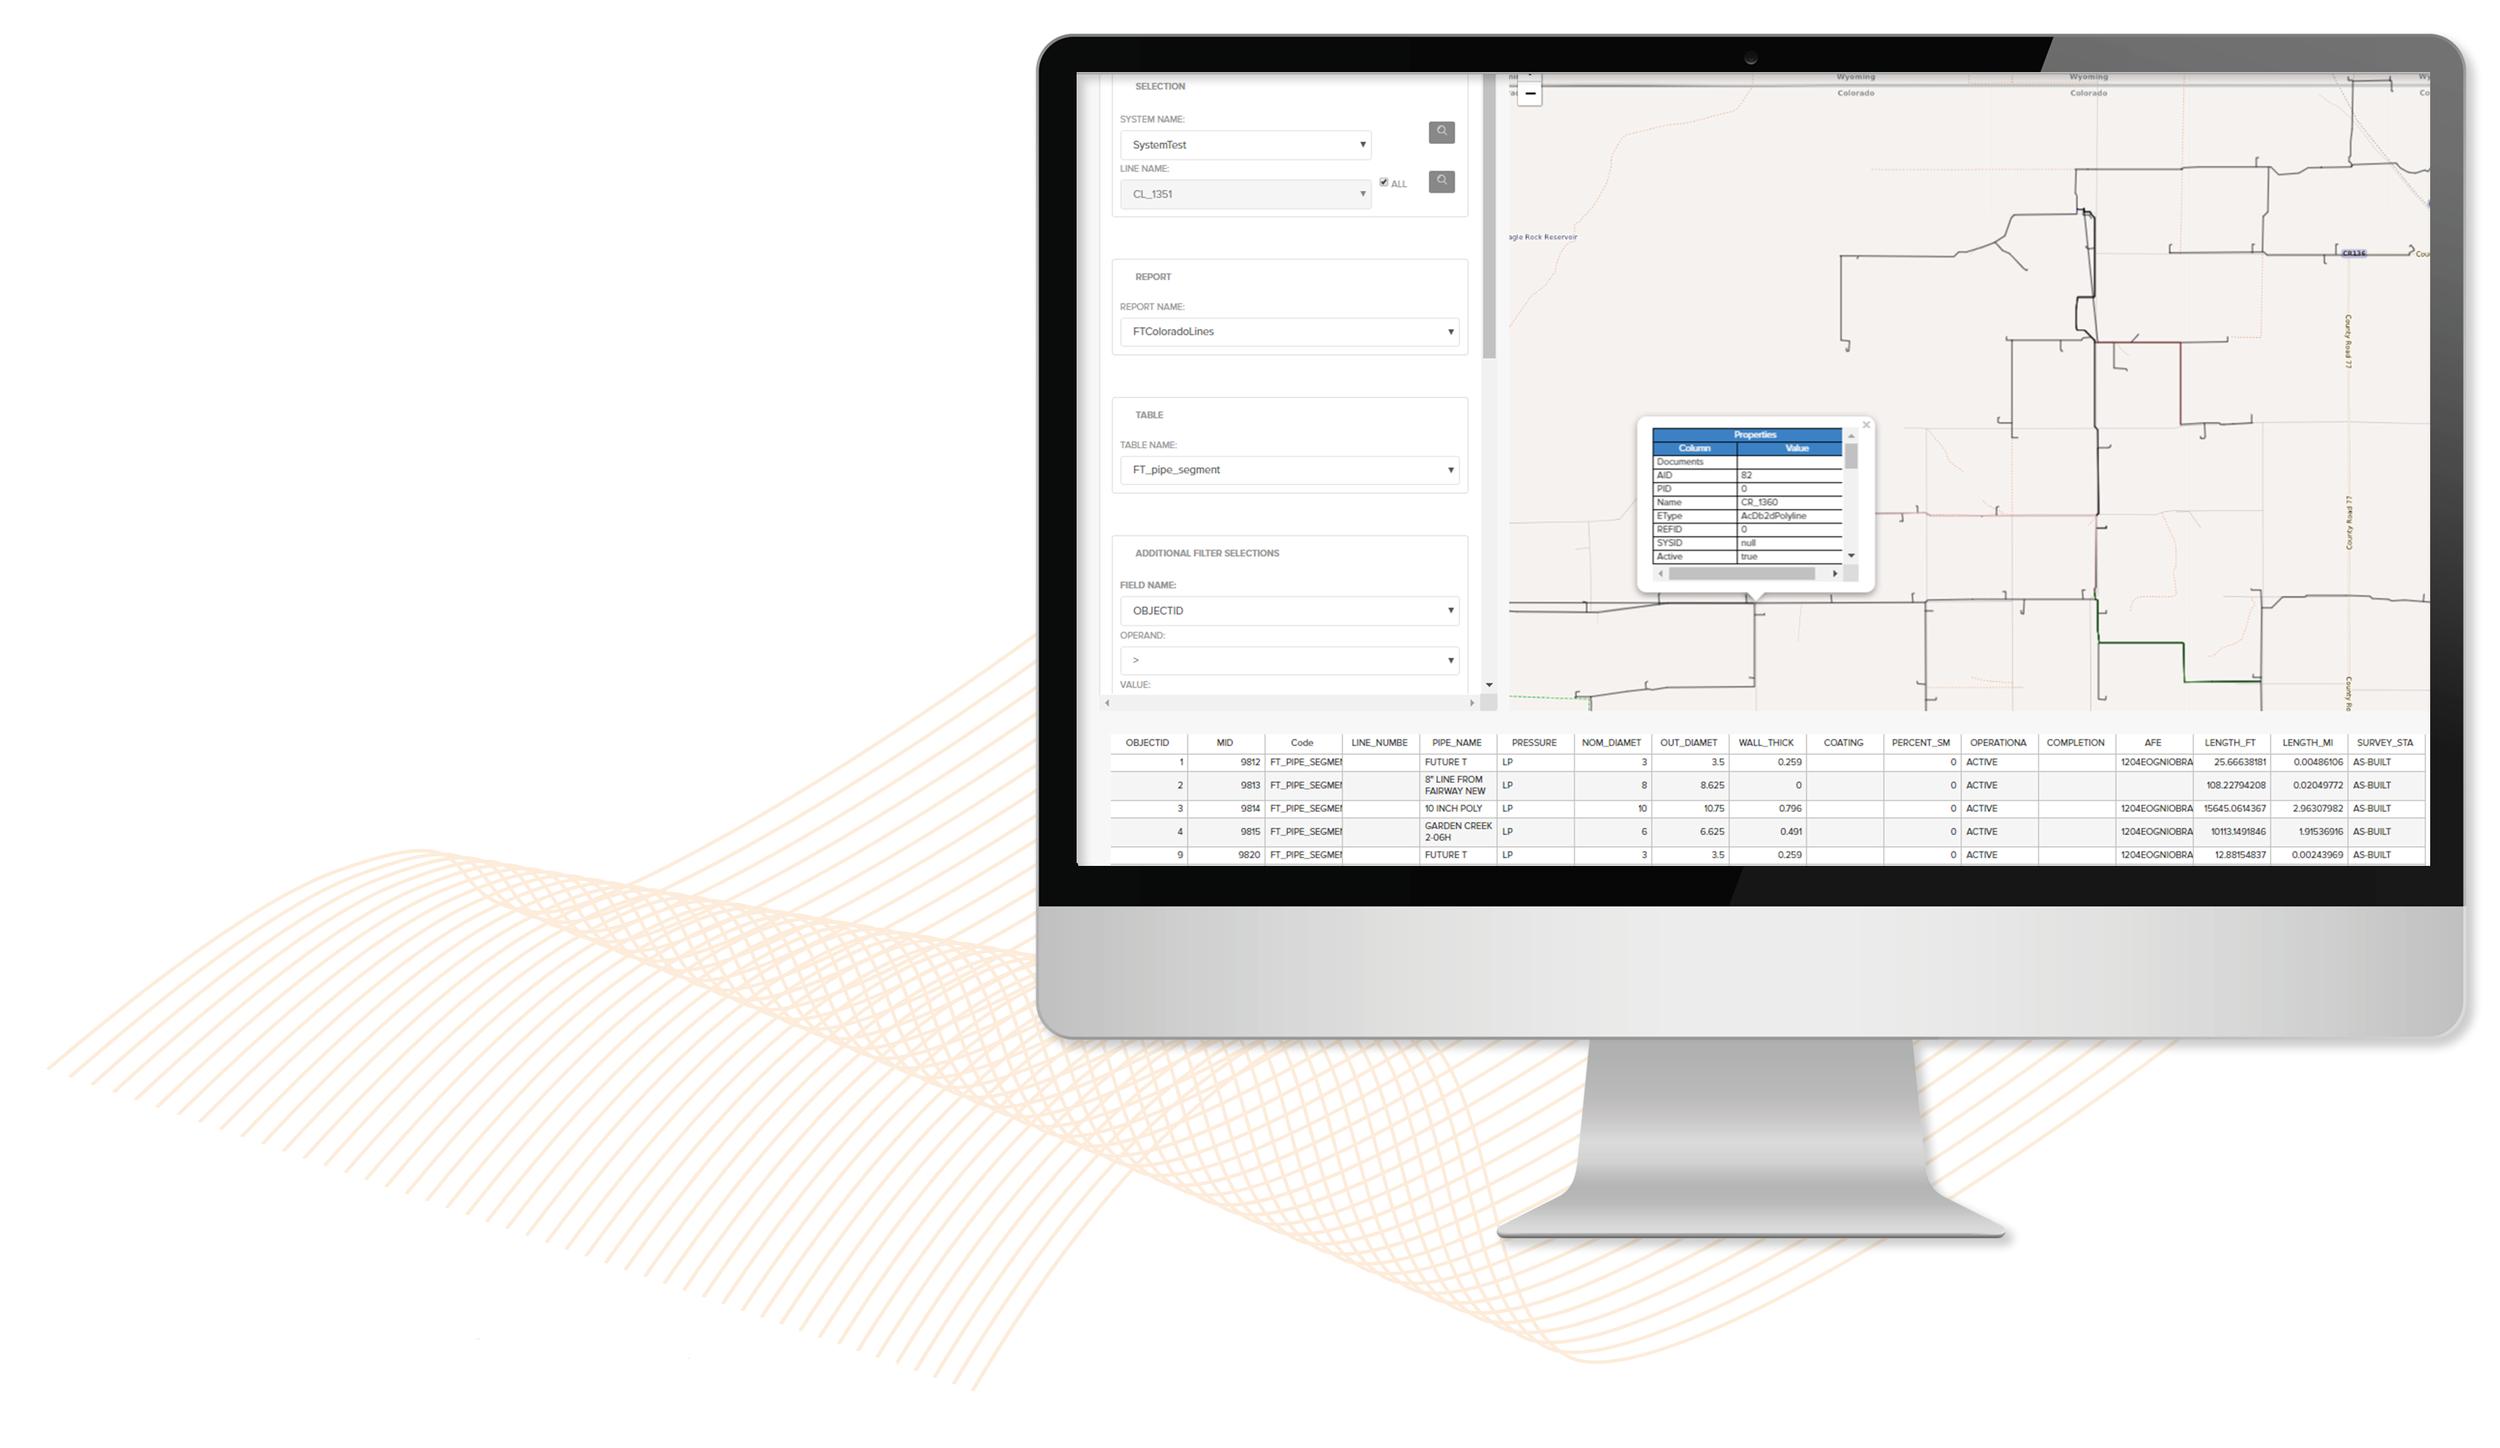 asset monitor screenshot.png